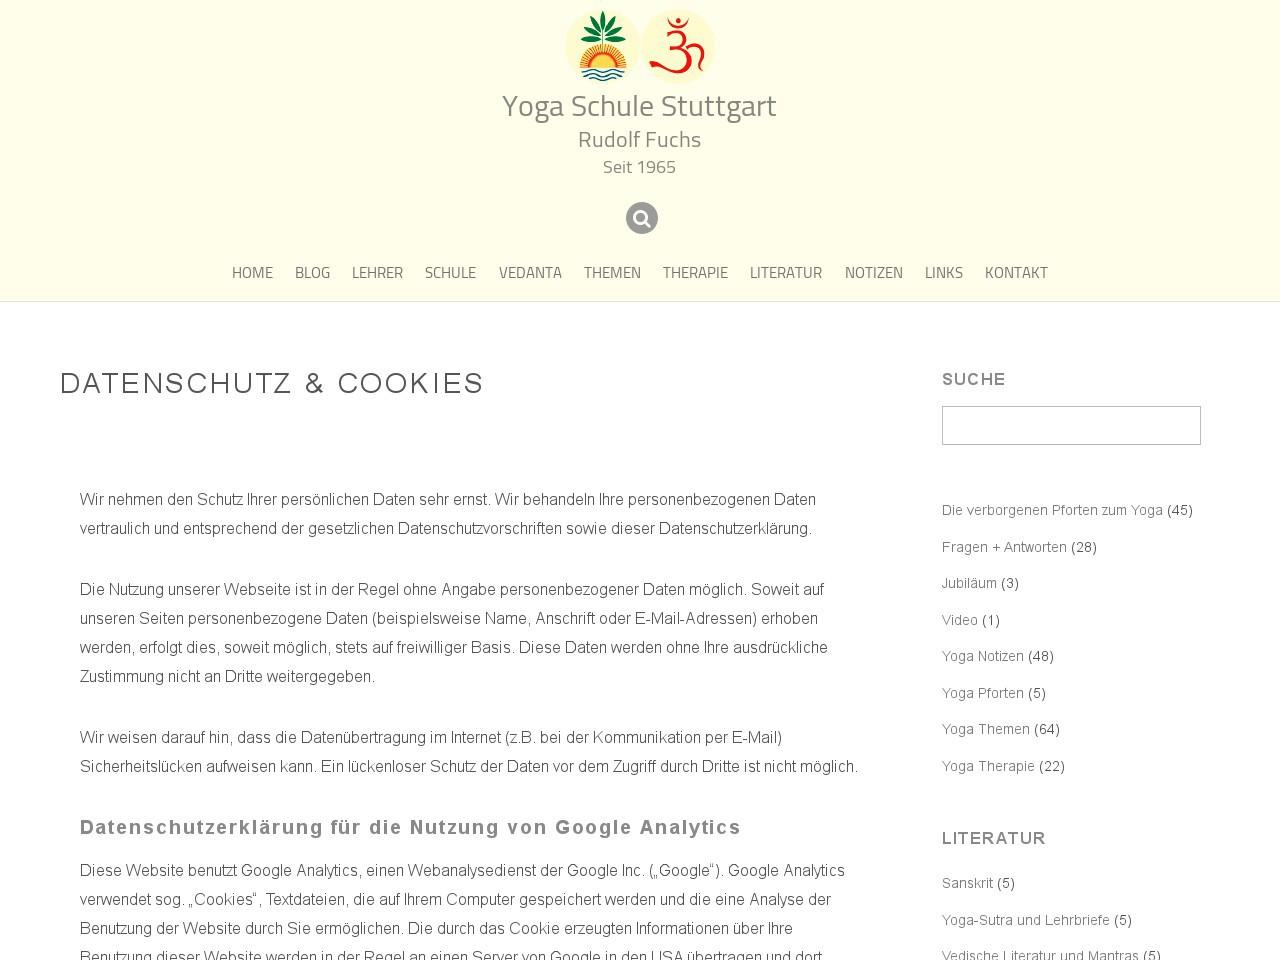 Datenschutzerklärung - Yoga Schule Stuttgart